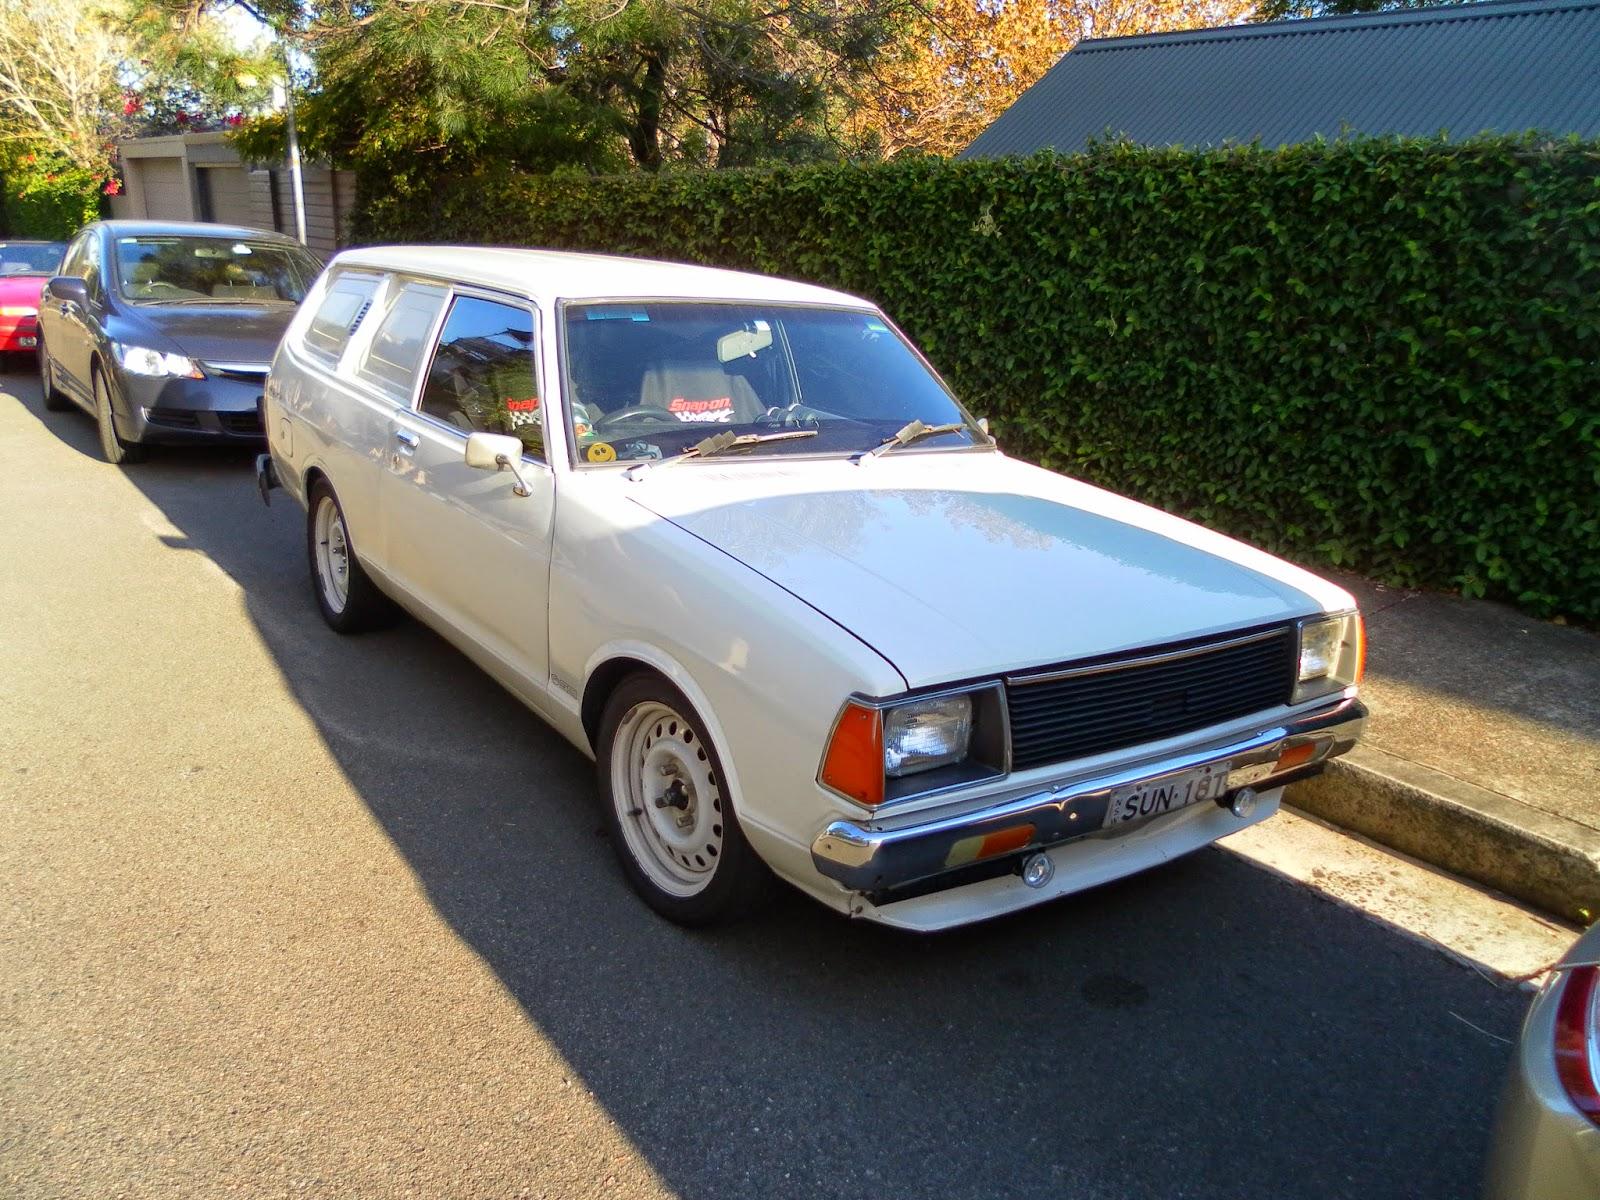 aussie old parked cars 1982 datsun sunny van b310